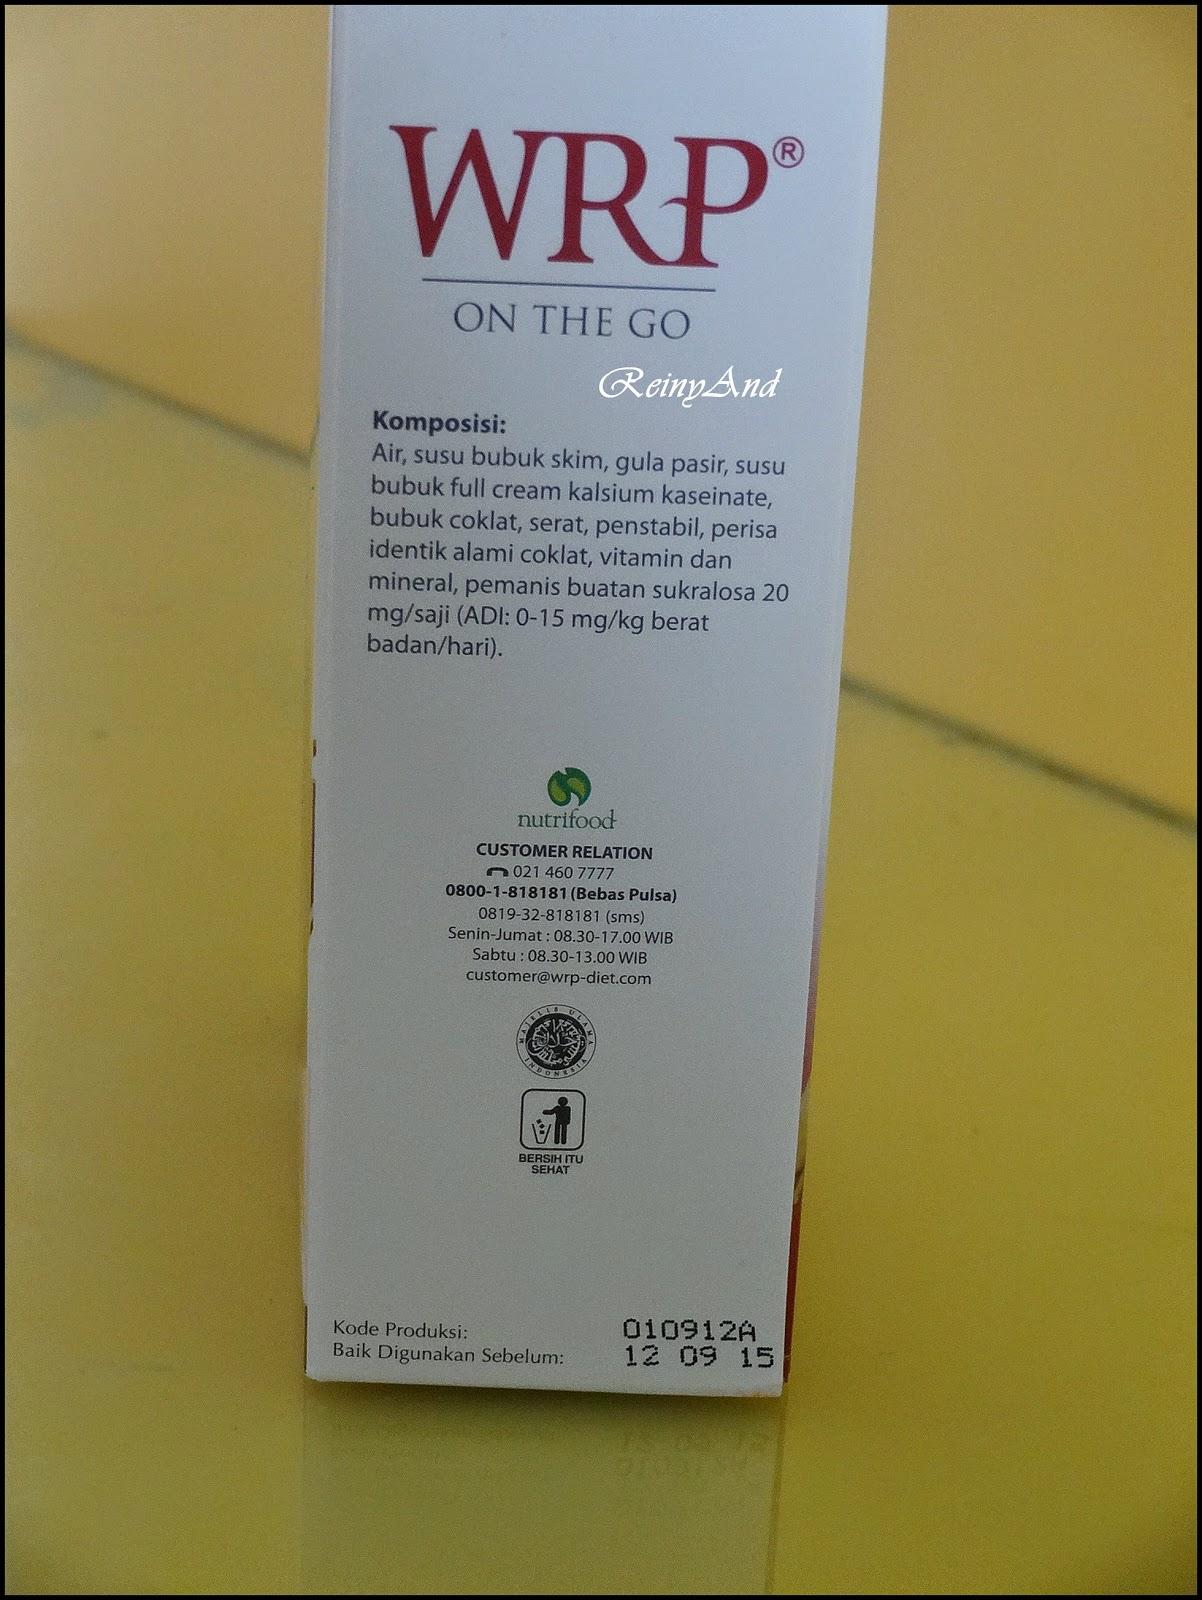 Herbalife vs WRP